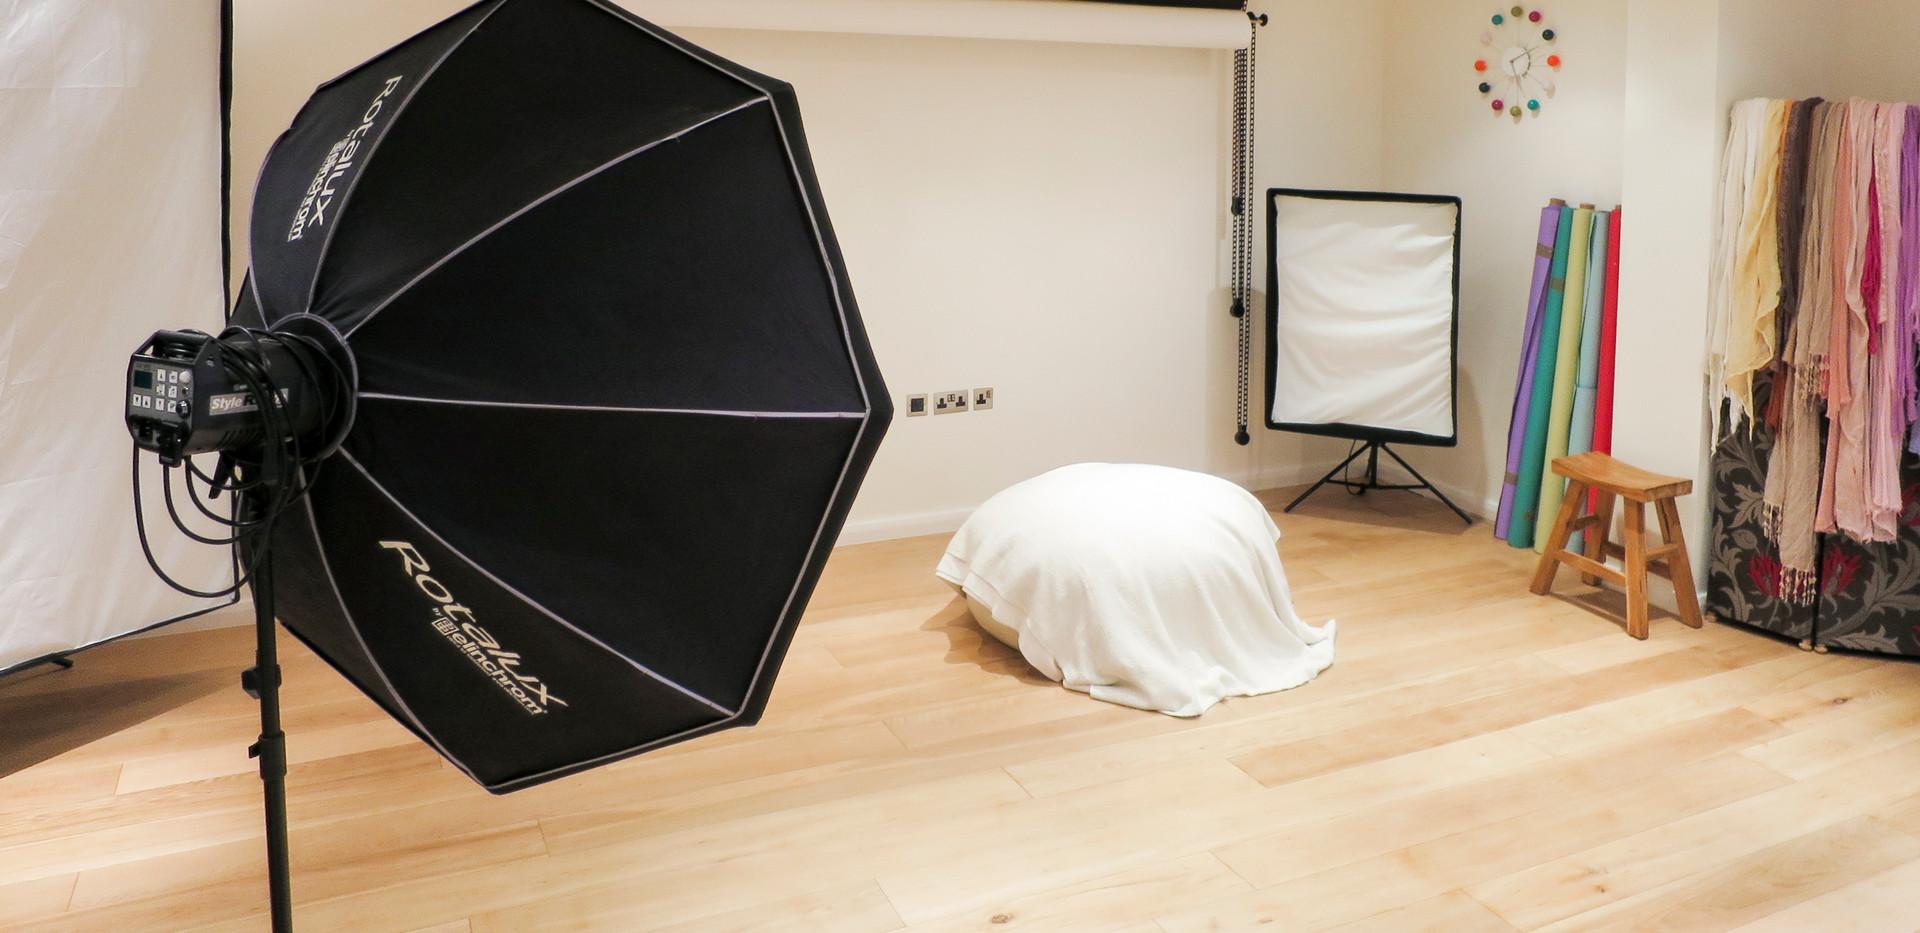 Studio Portraits in Richmond, London